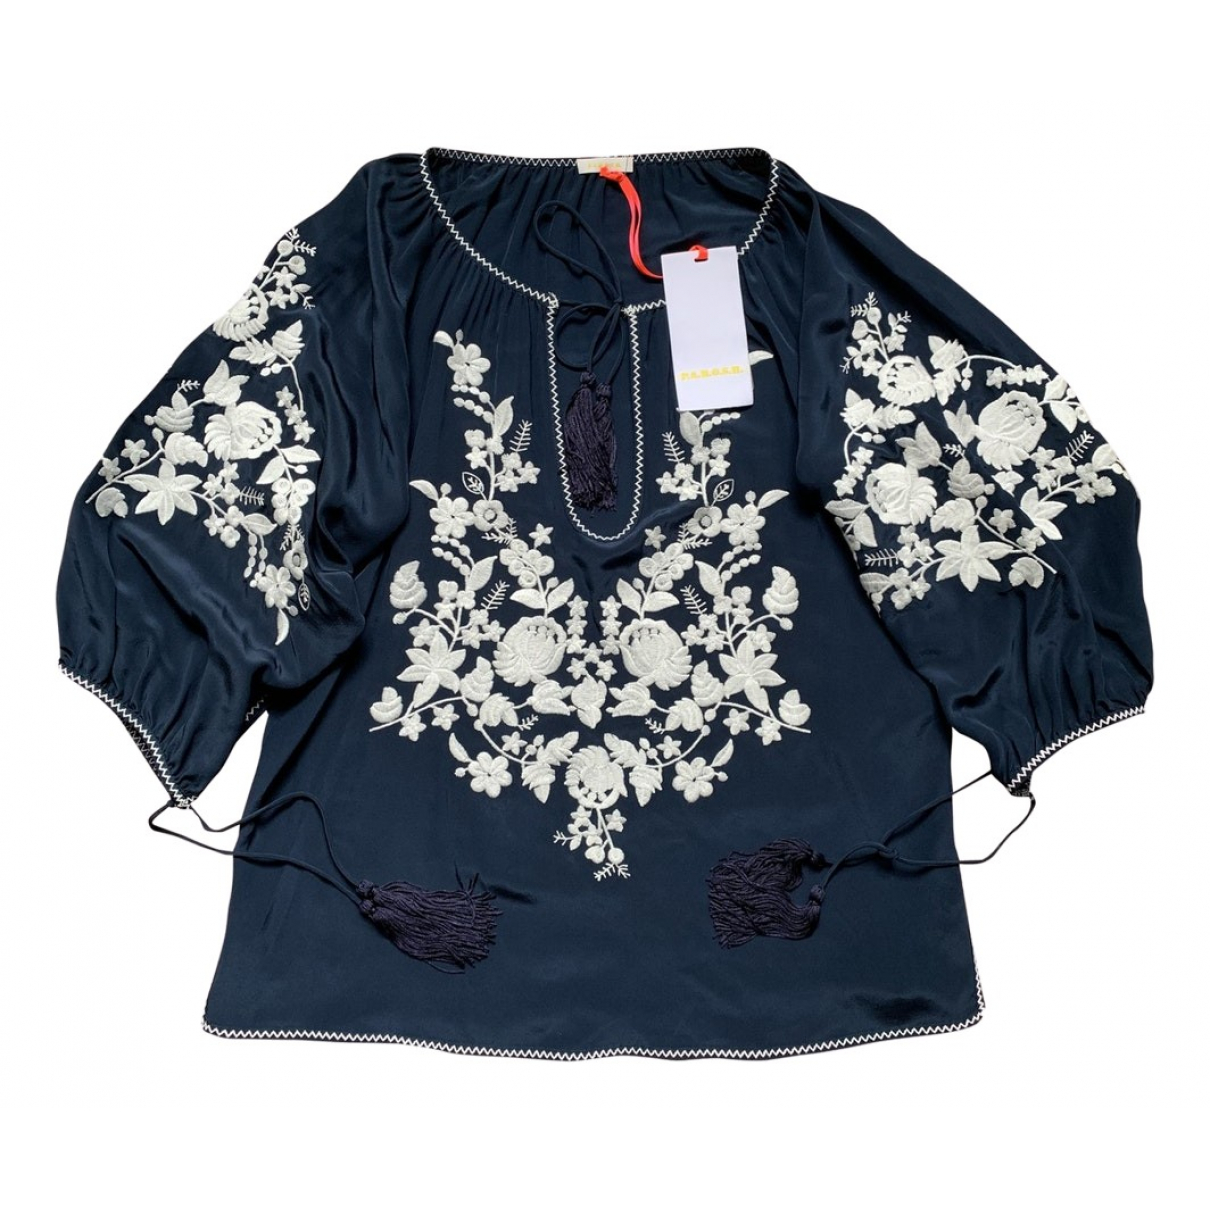 Parosh N Navy Silk  top for Women XS International